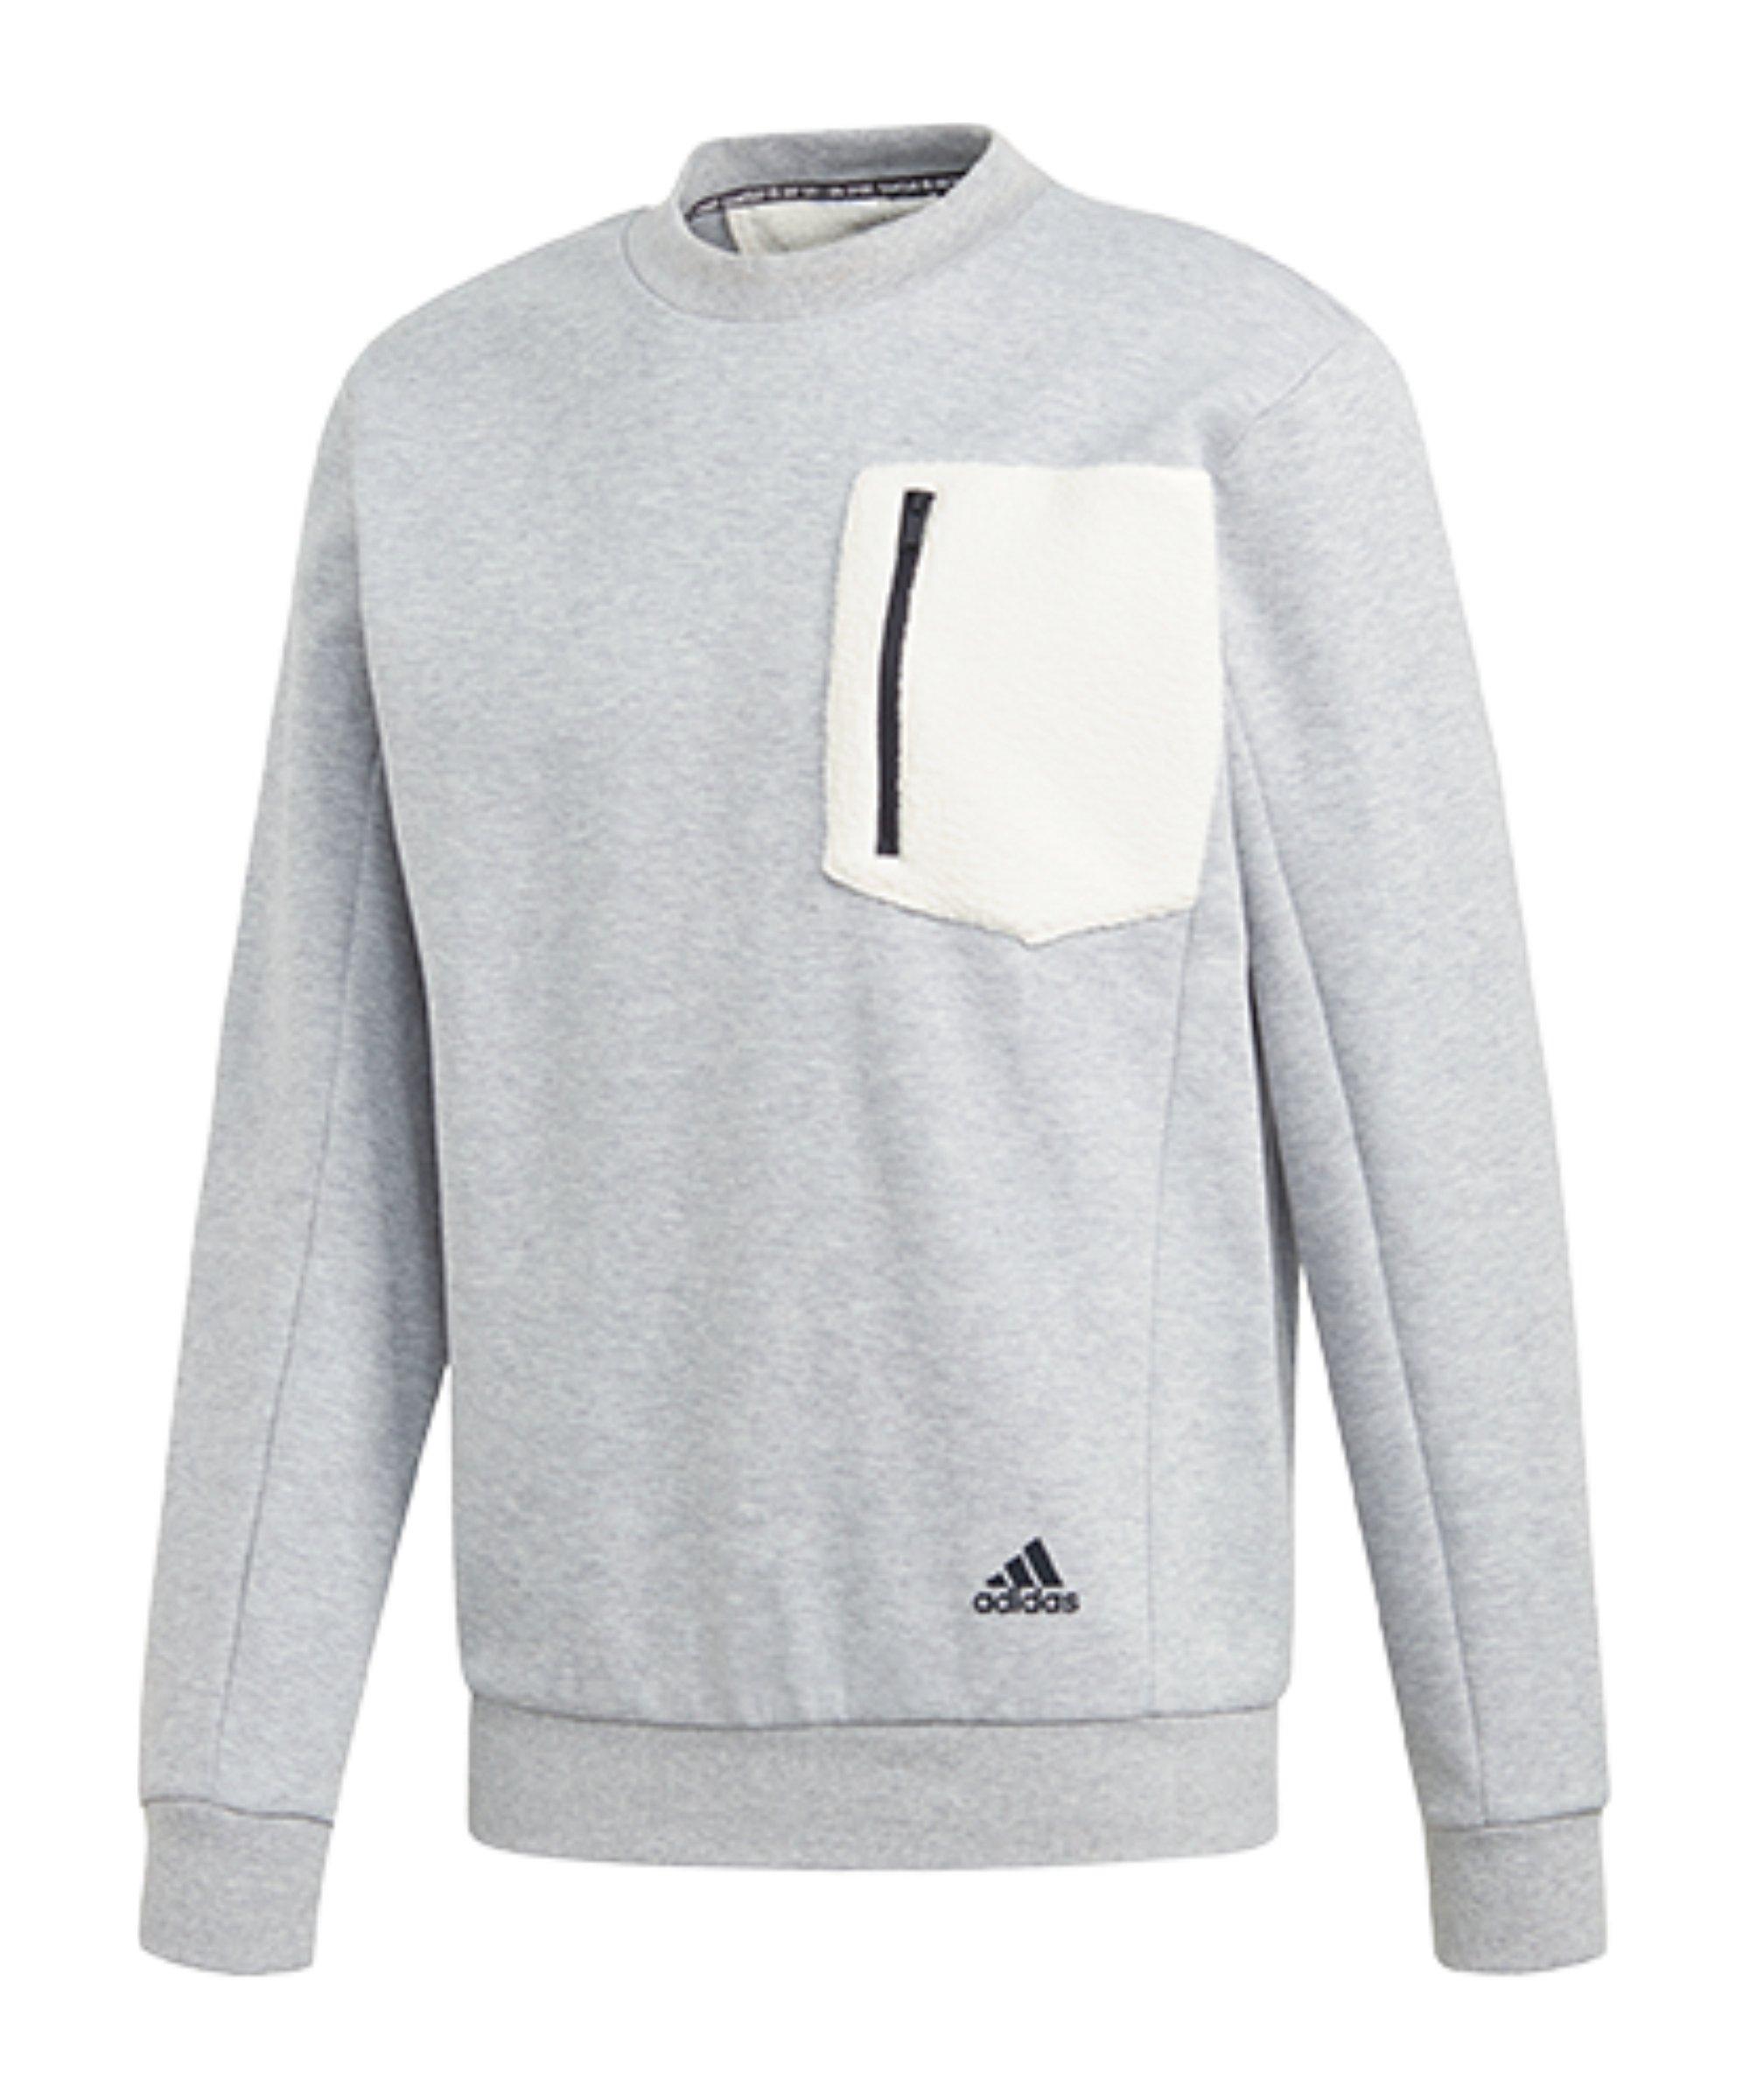 adidas BOS Fleece Sweatshirt Grau Weiss - grau